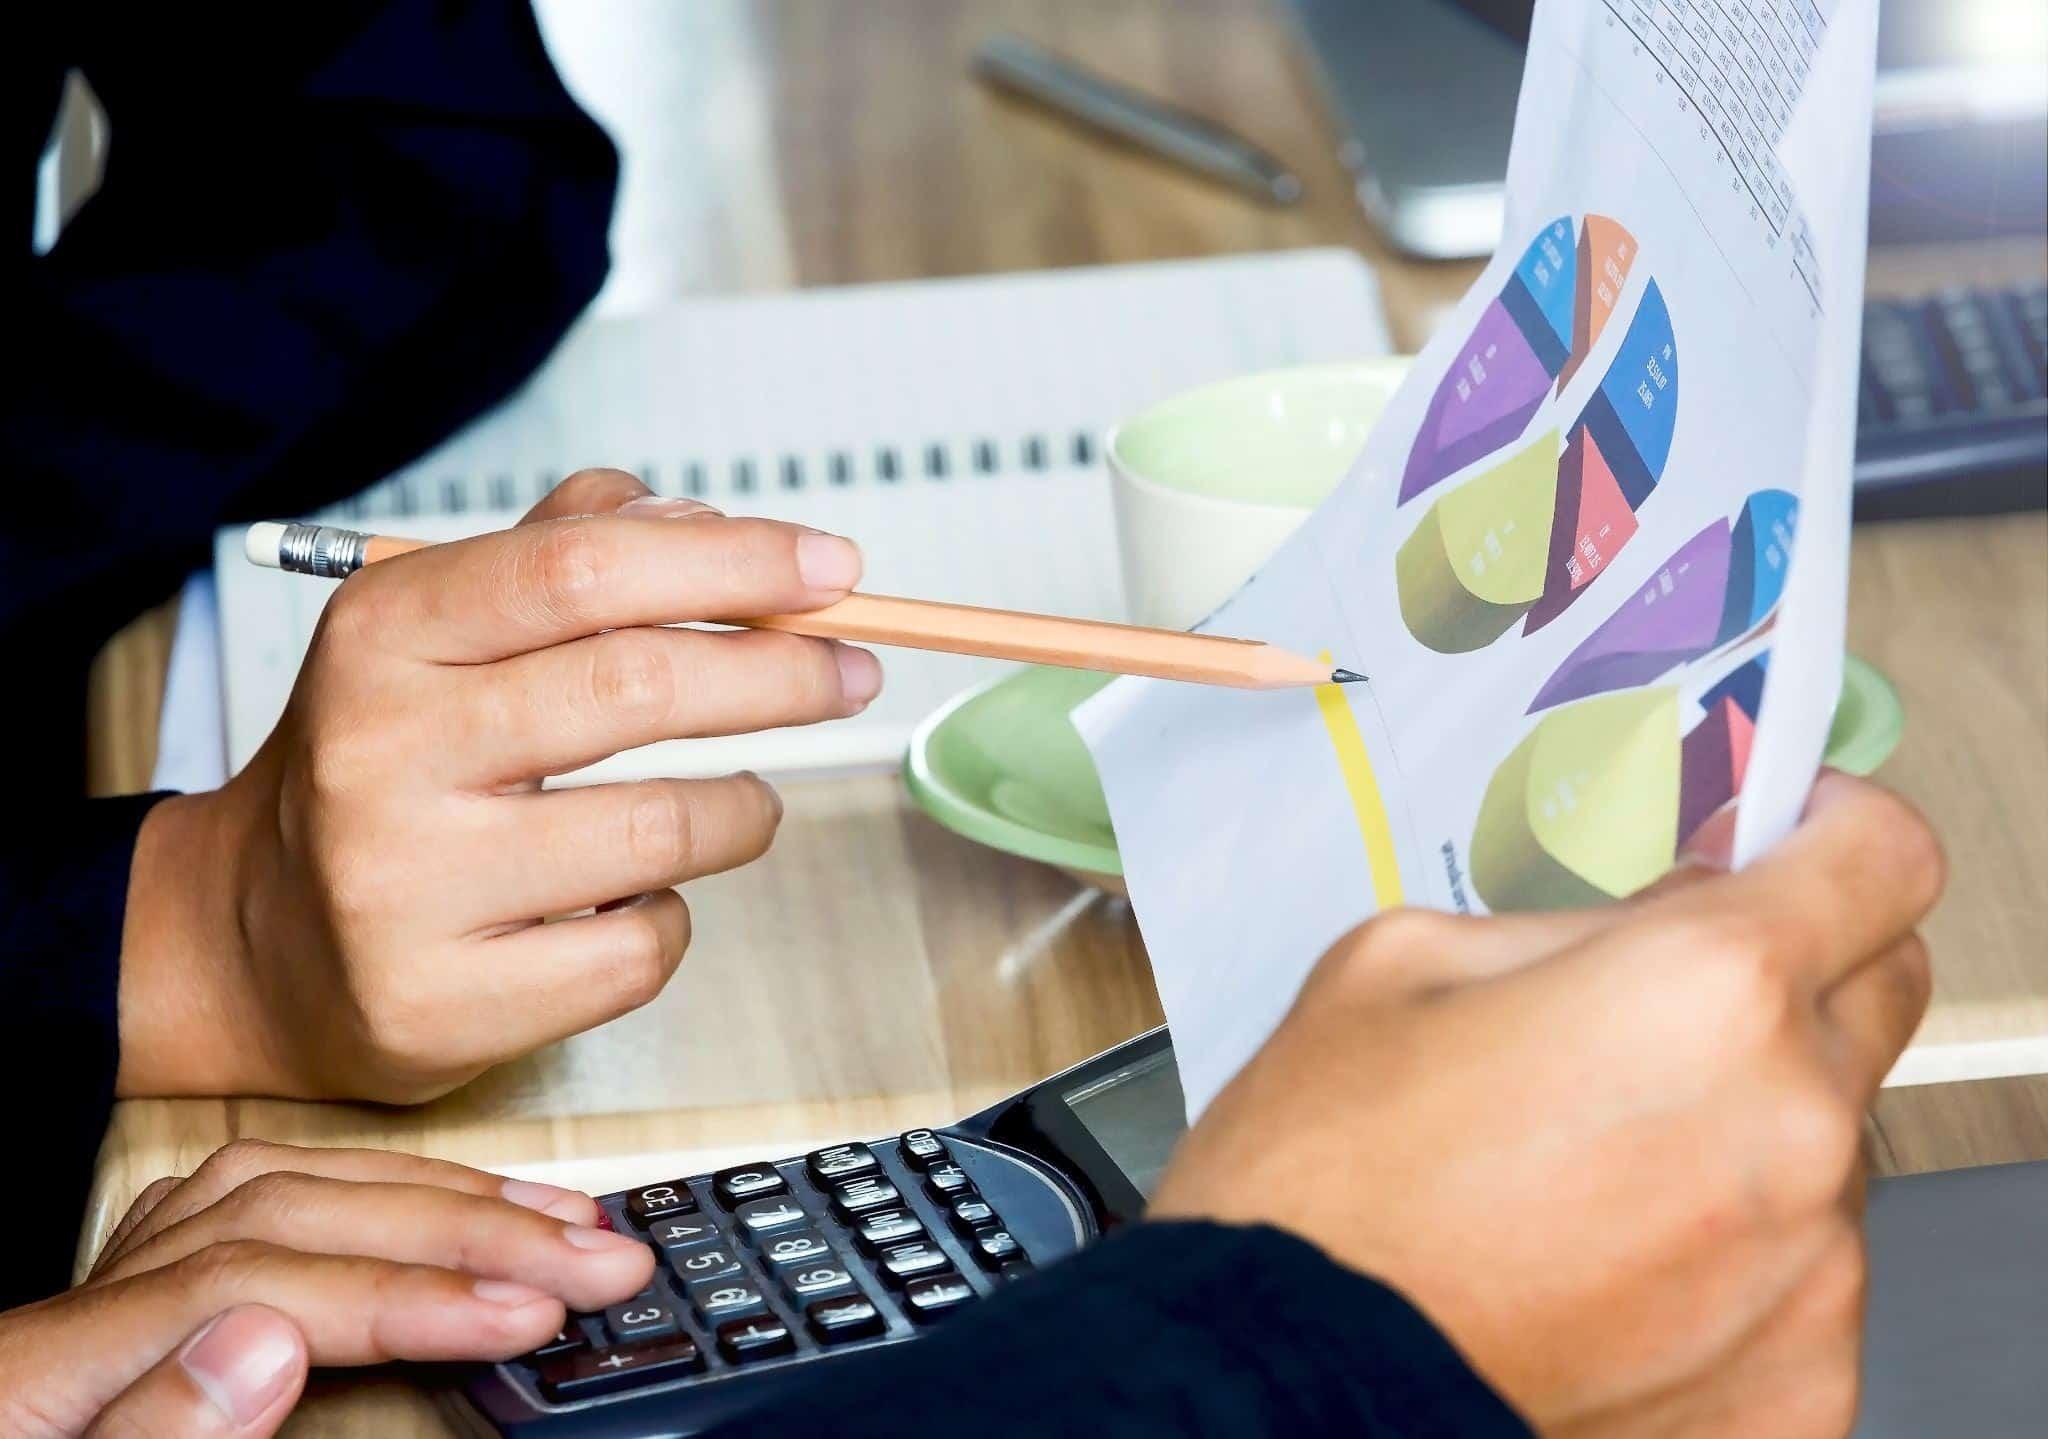 How Finance as a Service Helps SaaS Companies to Grow